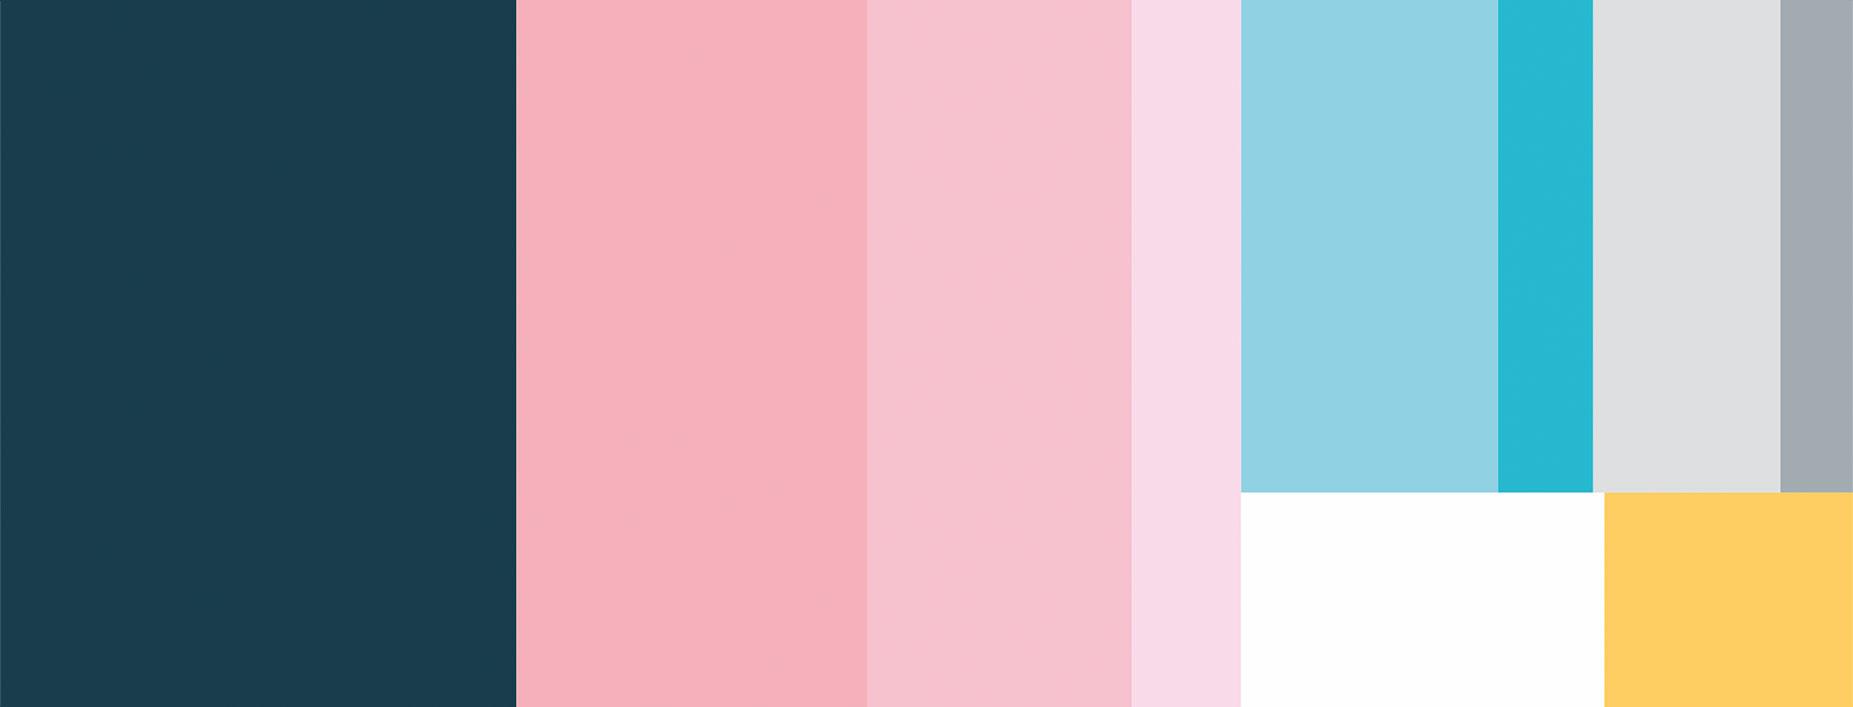 ZanBarnett-Branding-TB-Palette.jpg